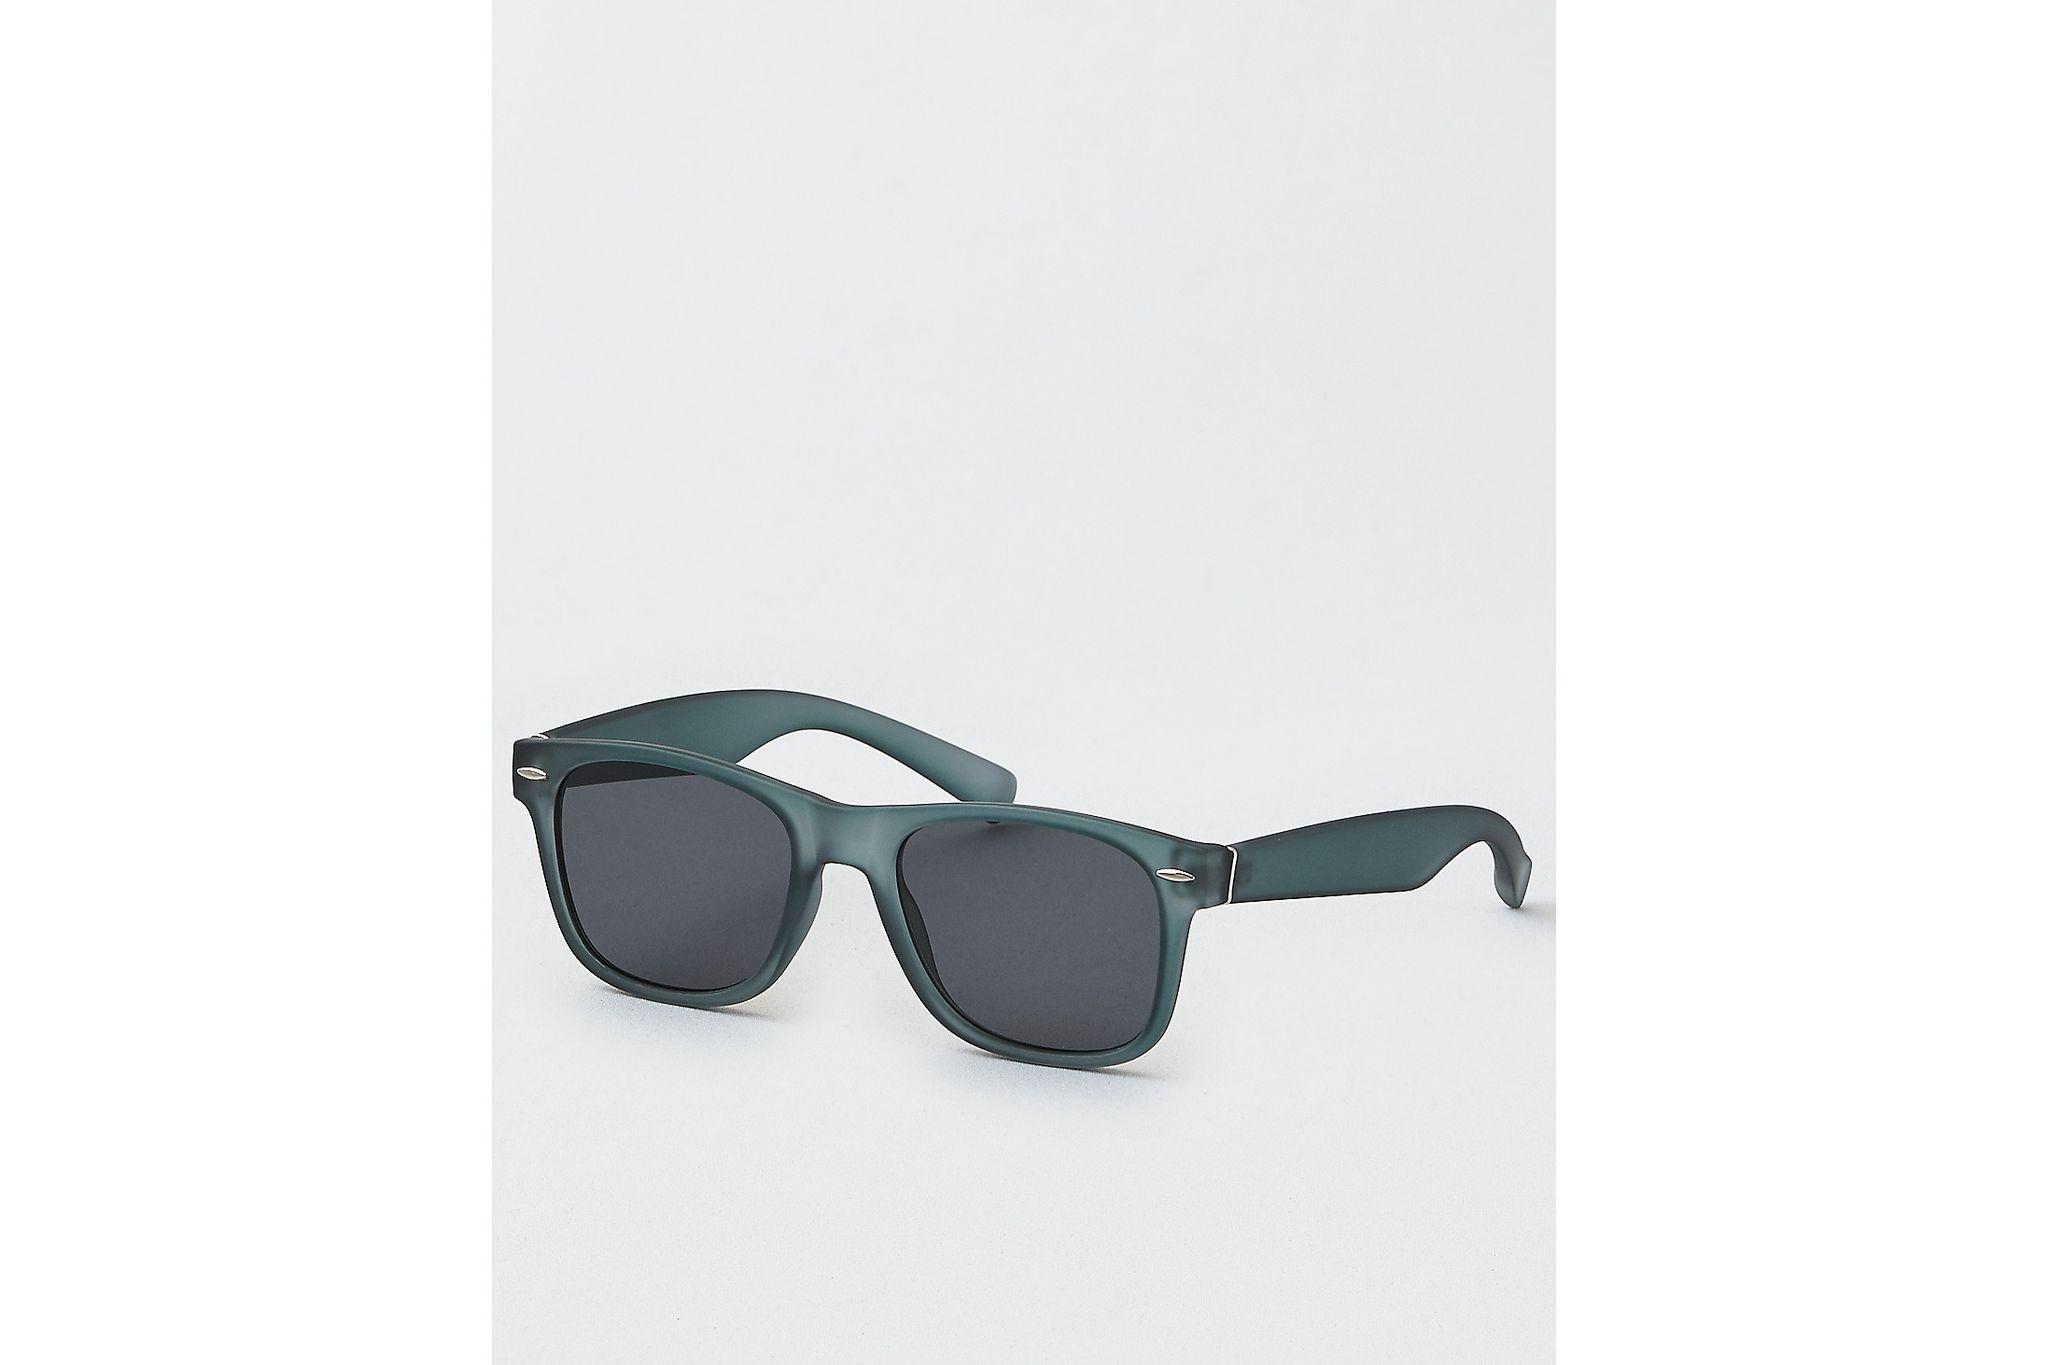 deddfd7c5d American Eagle Seafoam Wayfarer Sunglasses Price in Egypt